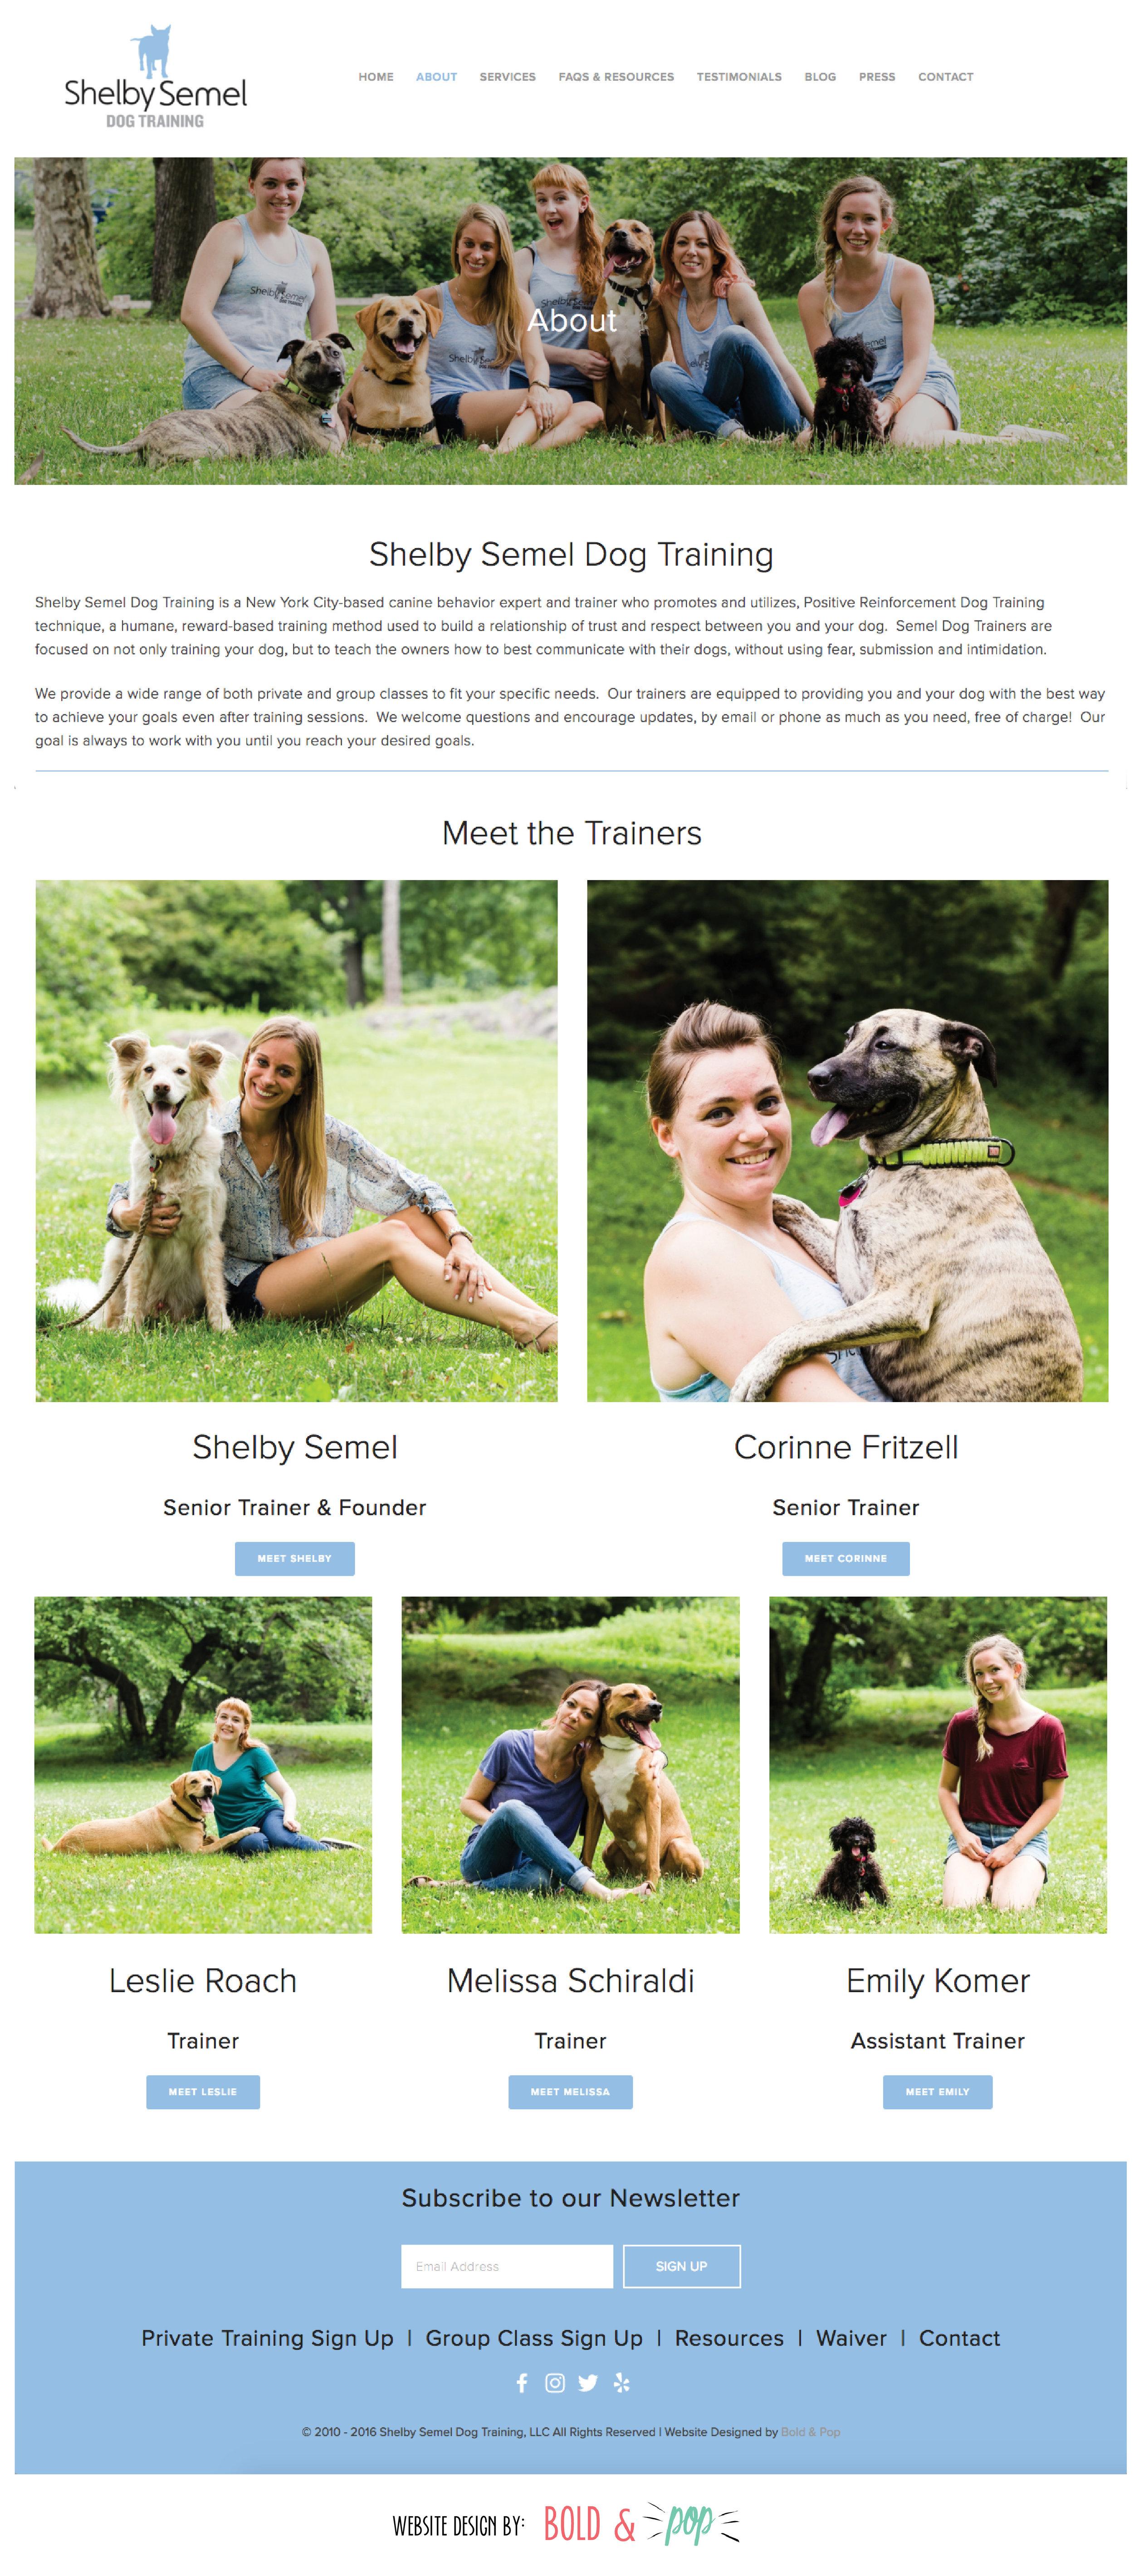 Bold & Pop : Shelby Semel Dog Training Website Design